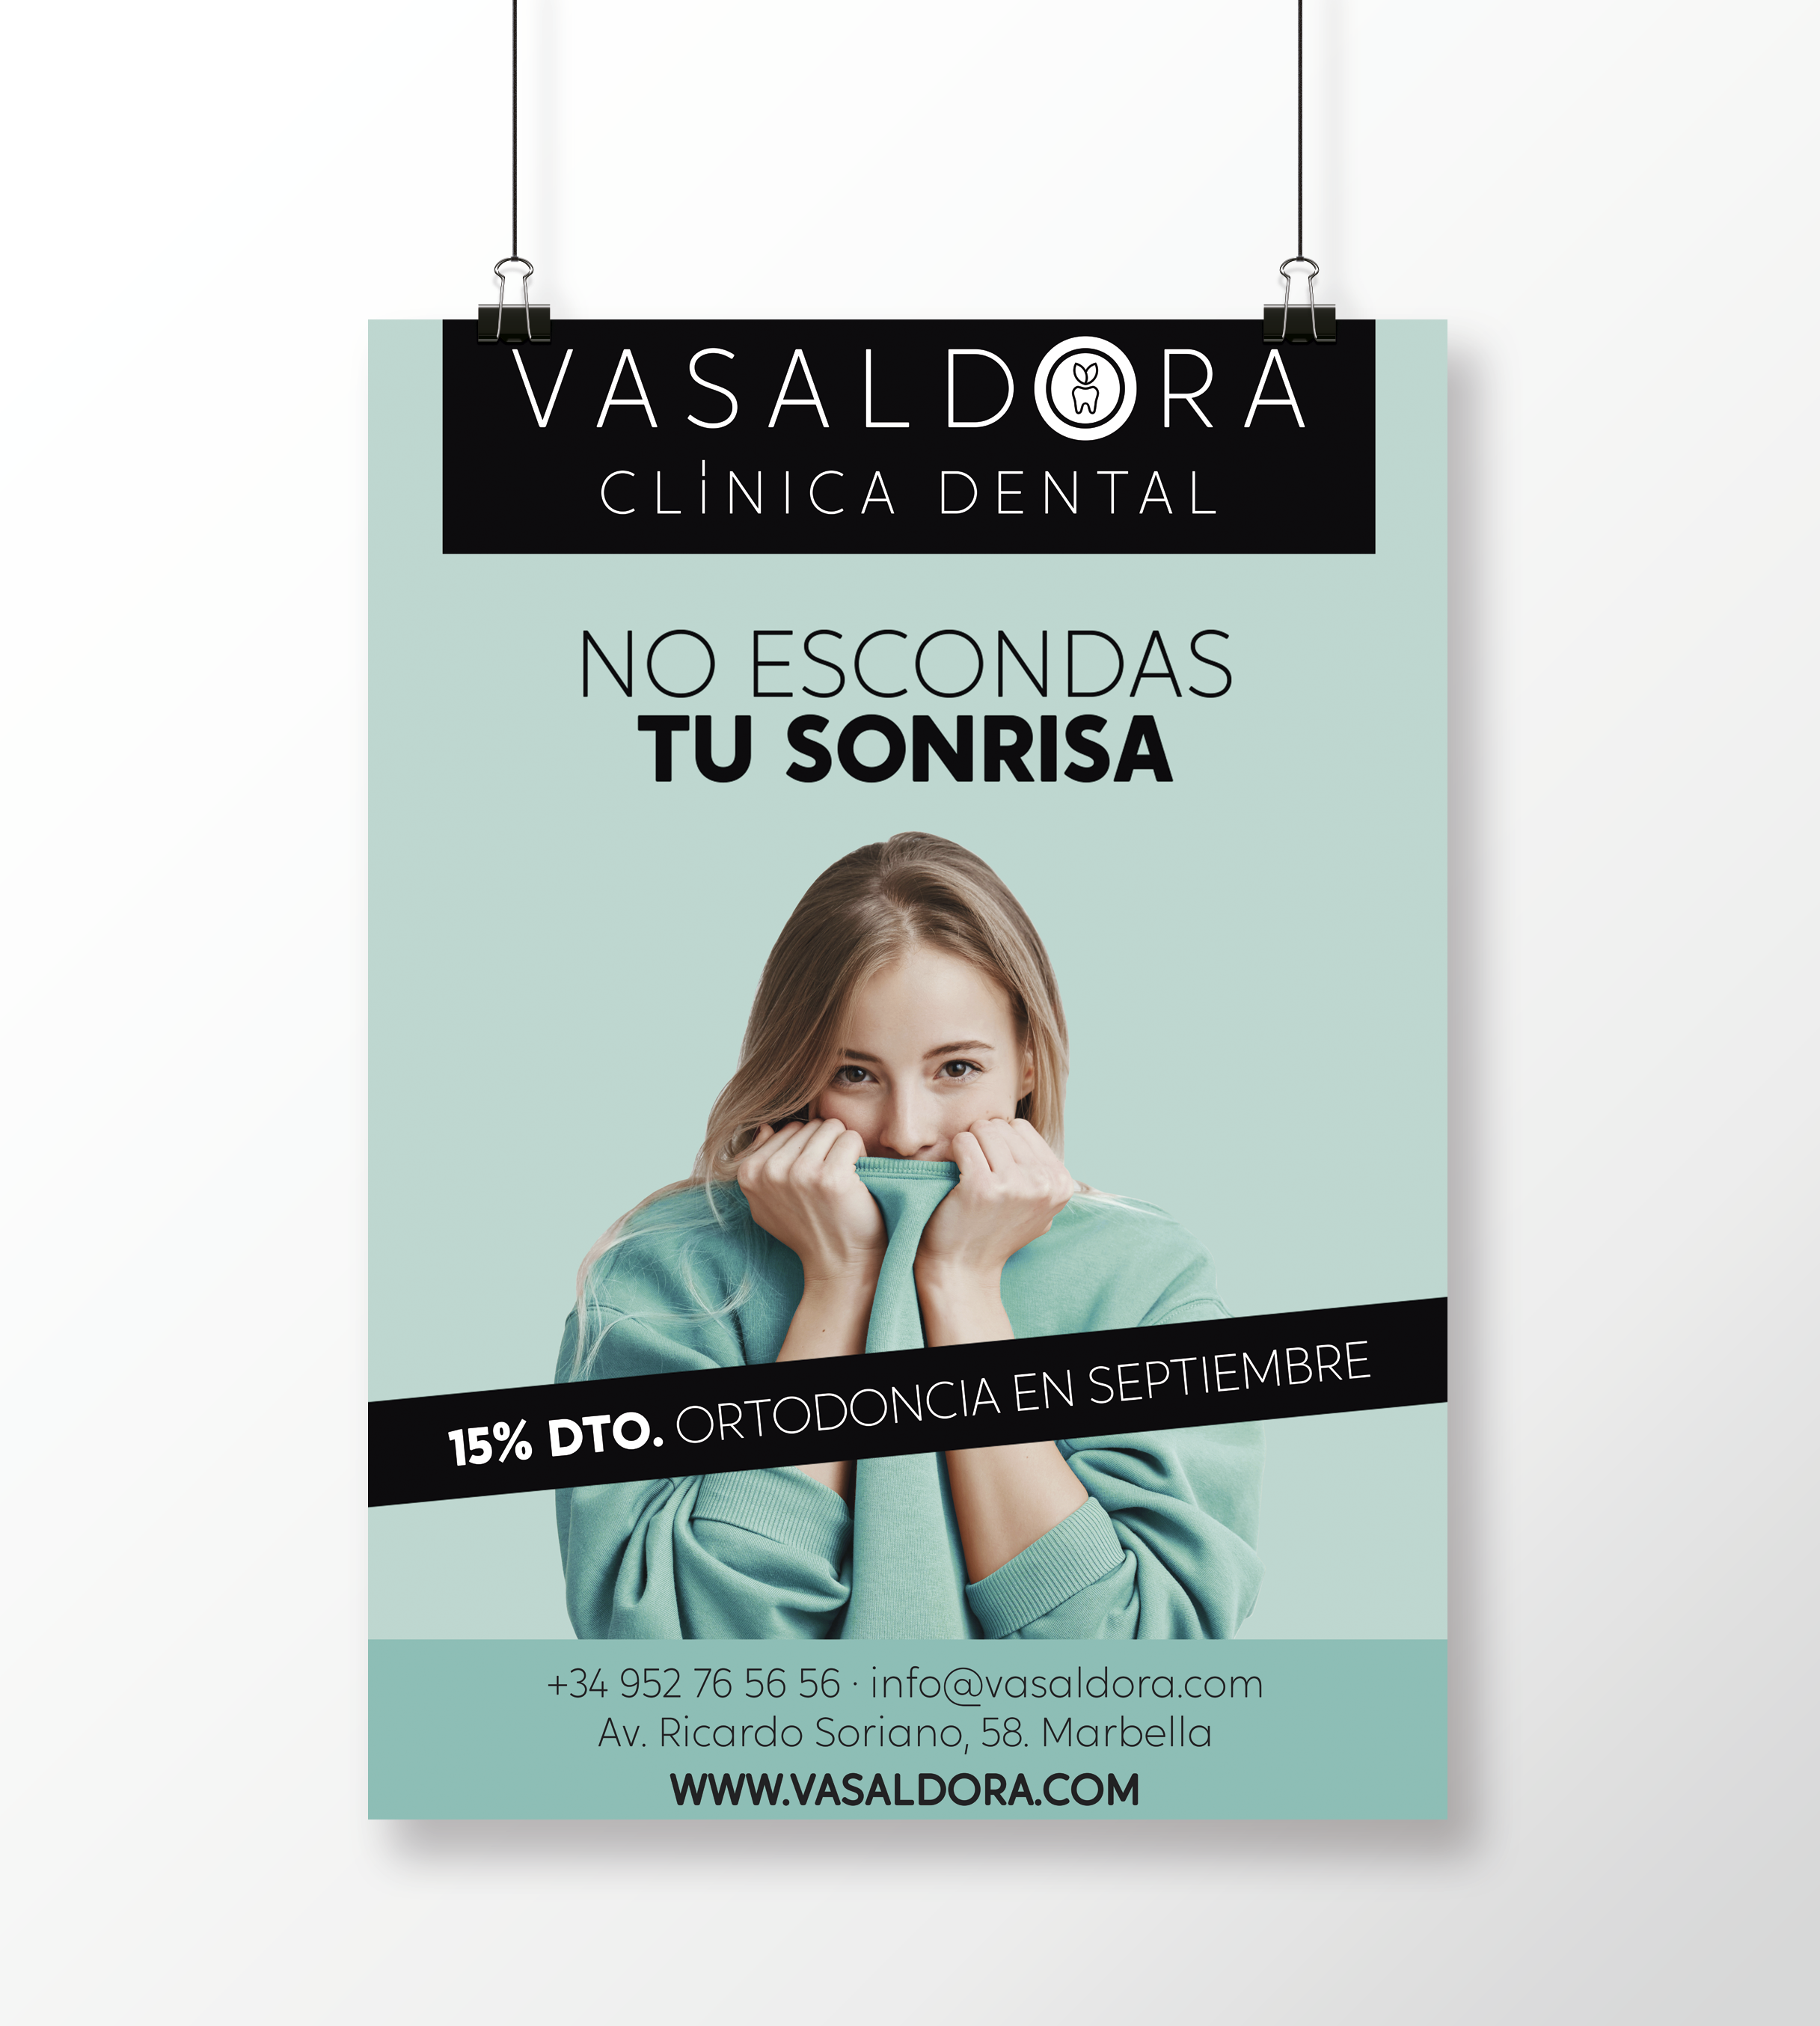 lamadredelosbeatles_VASALDORA_poster_2